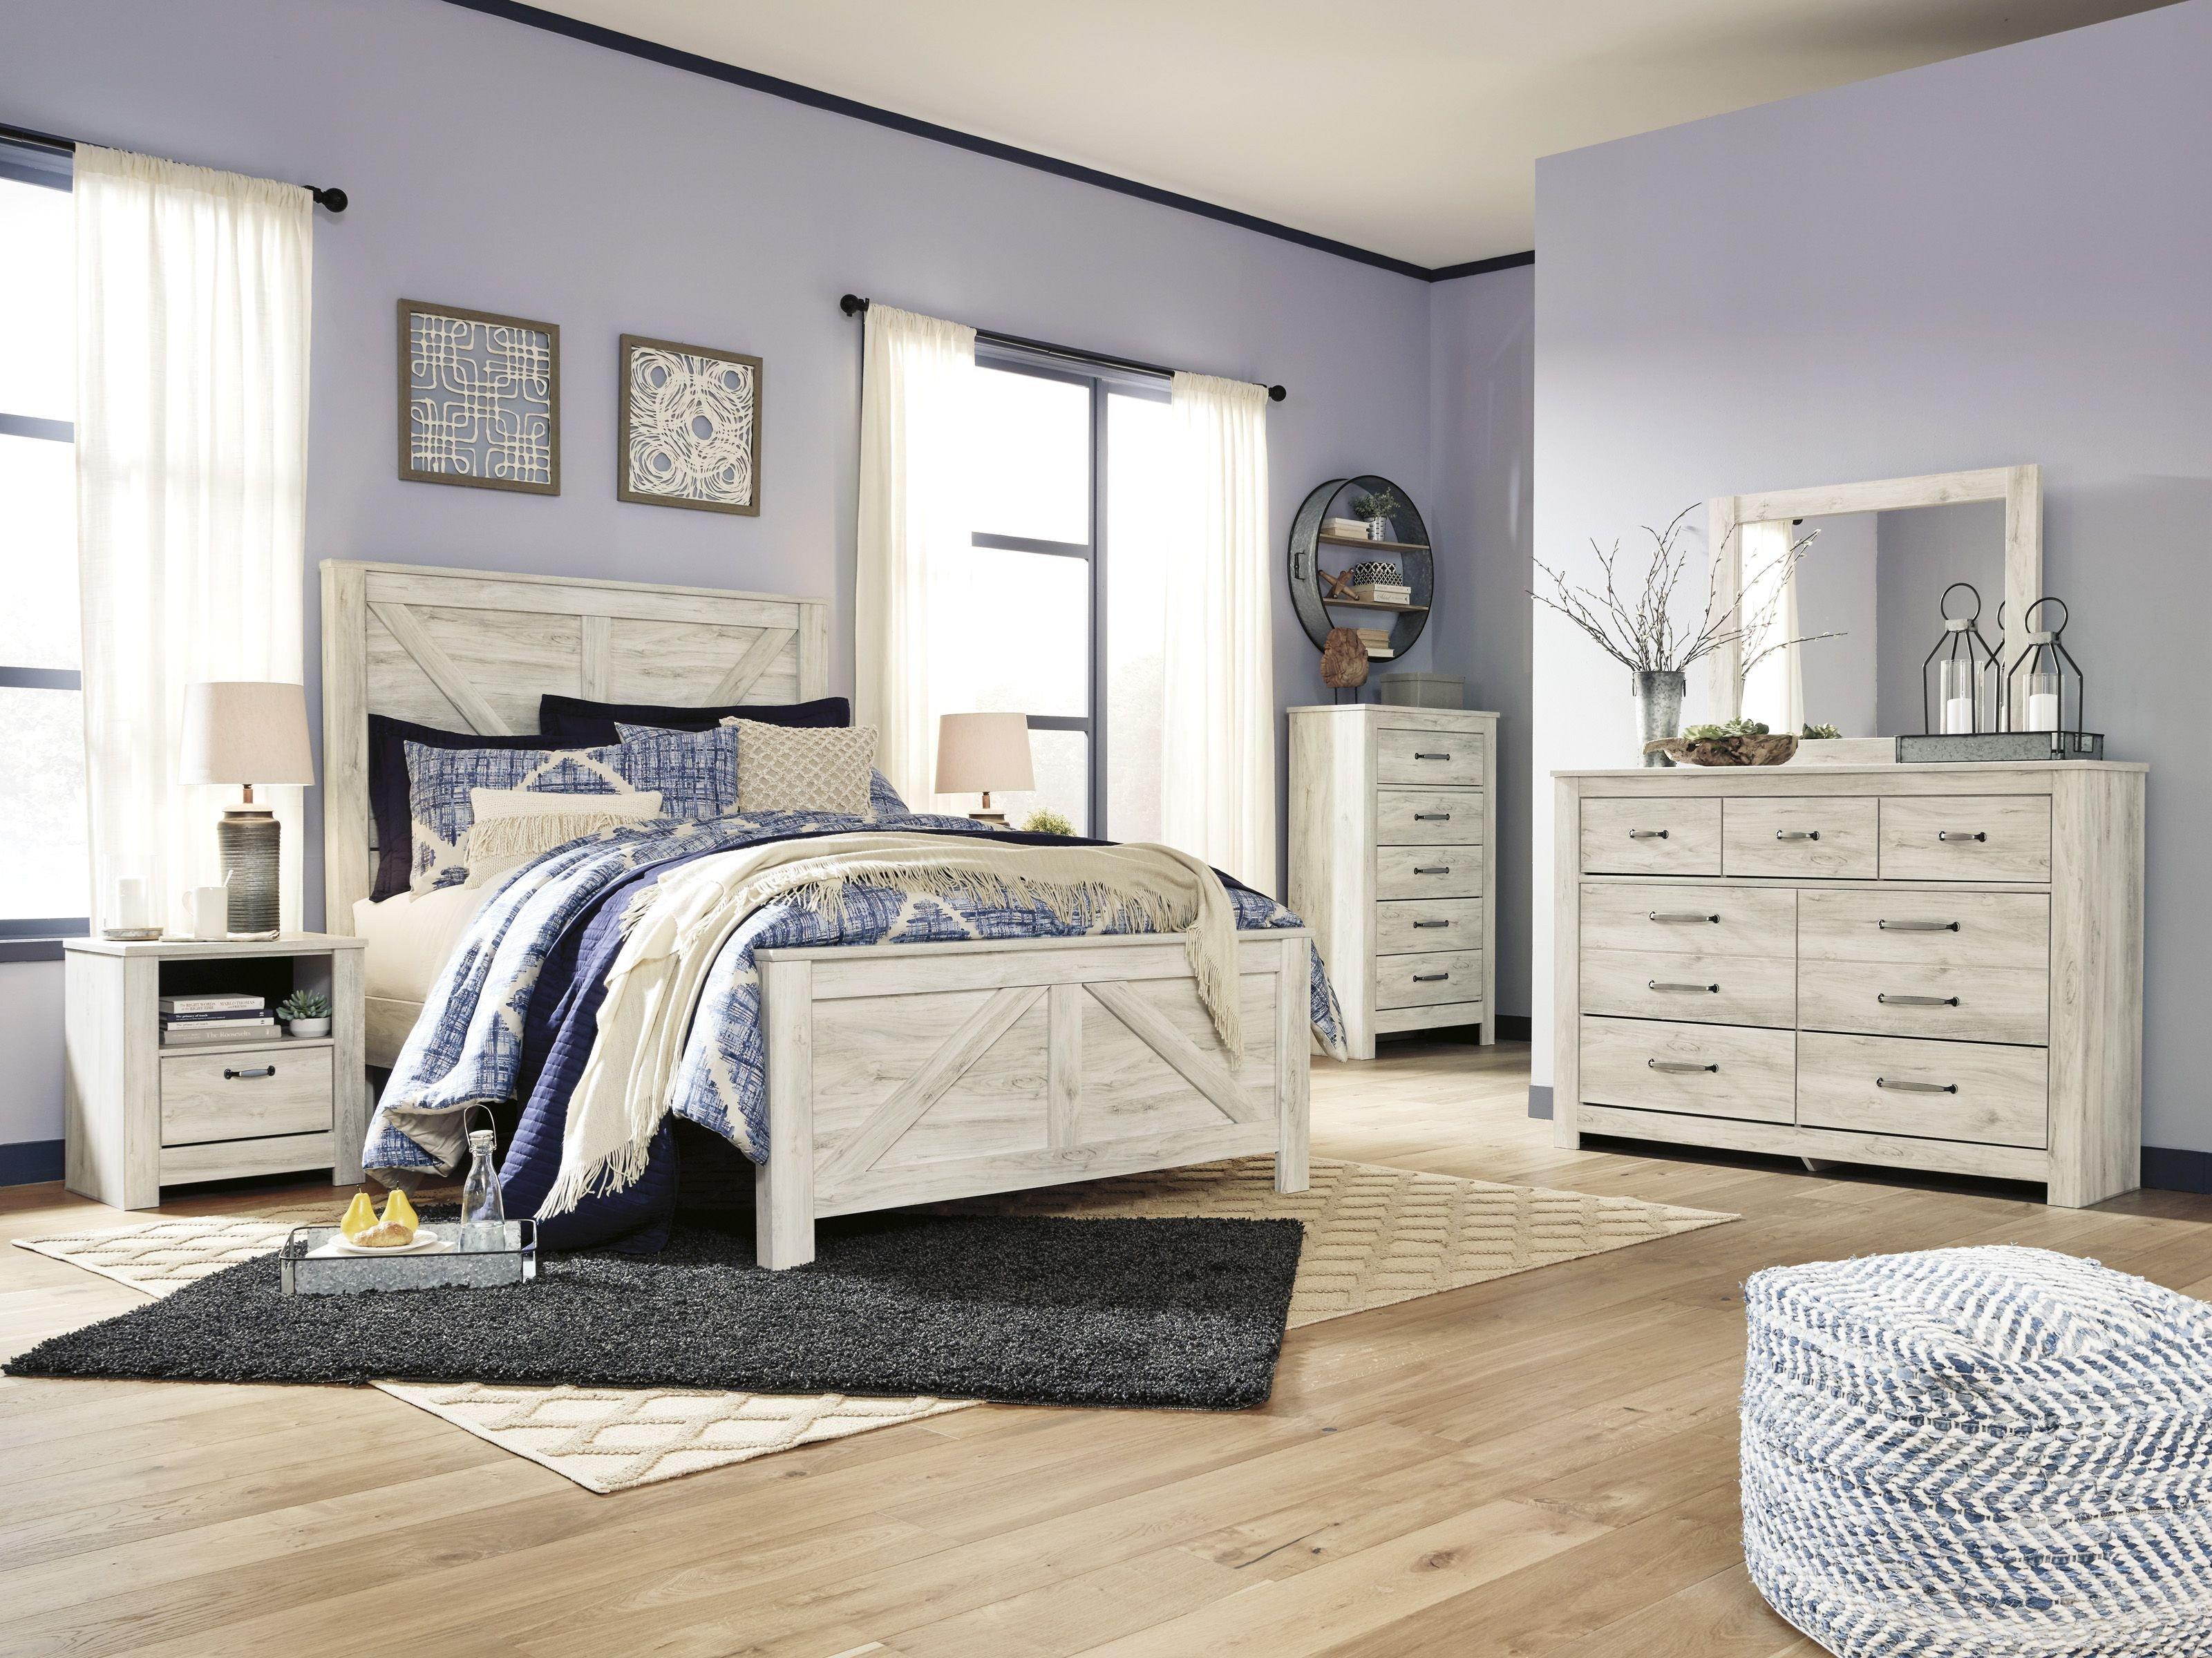 Ashley Furniture Bedroom Set Price Fresh Bellaby Whitewash Panel Bedroom Set